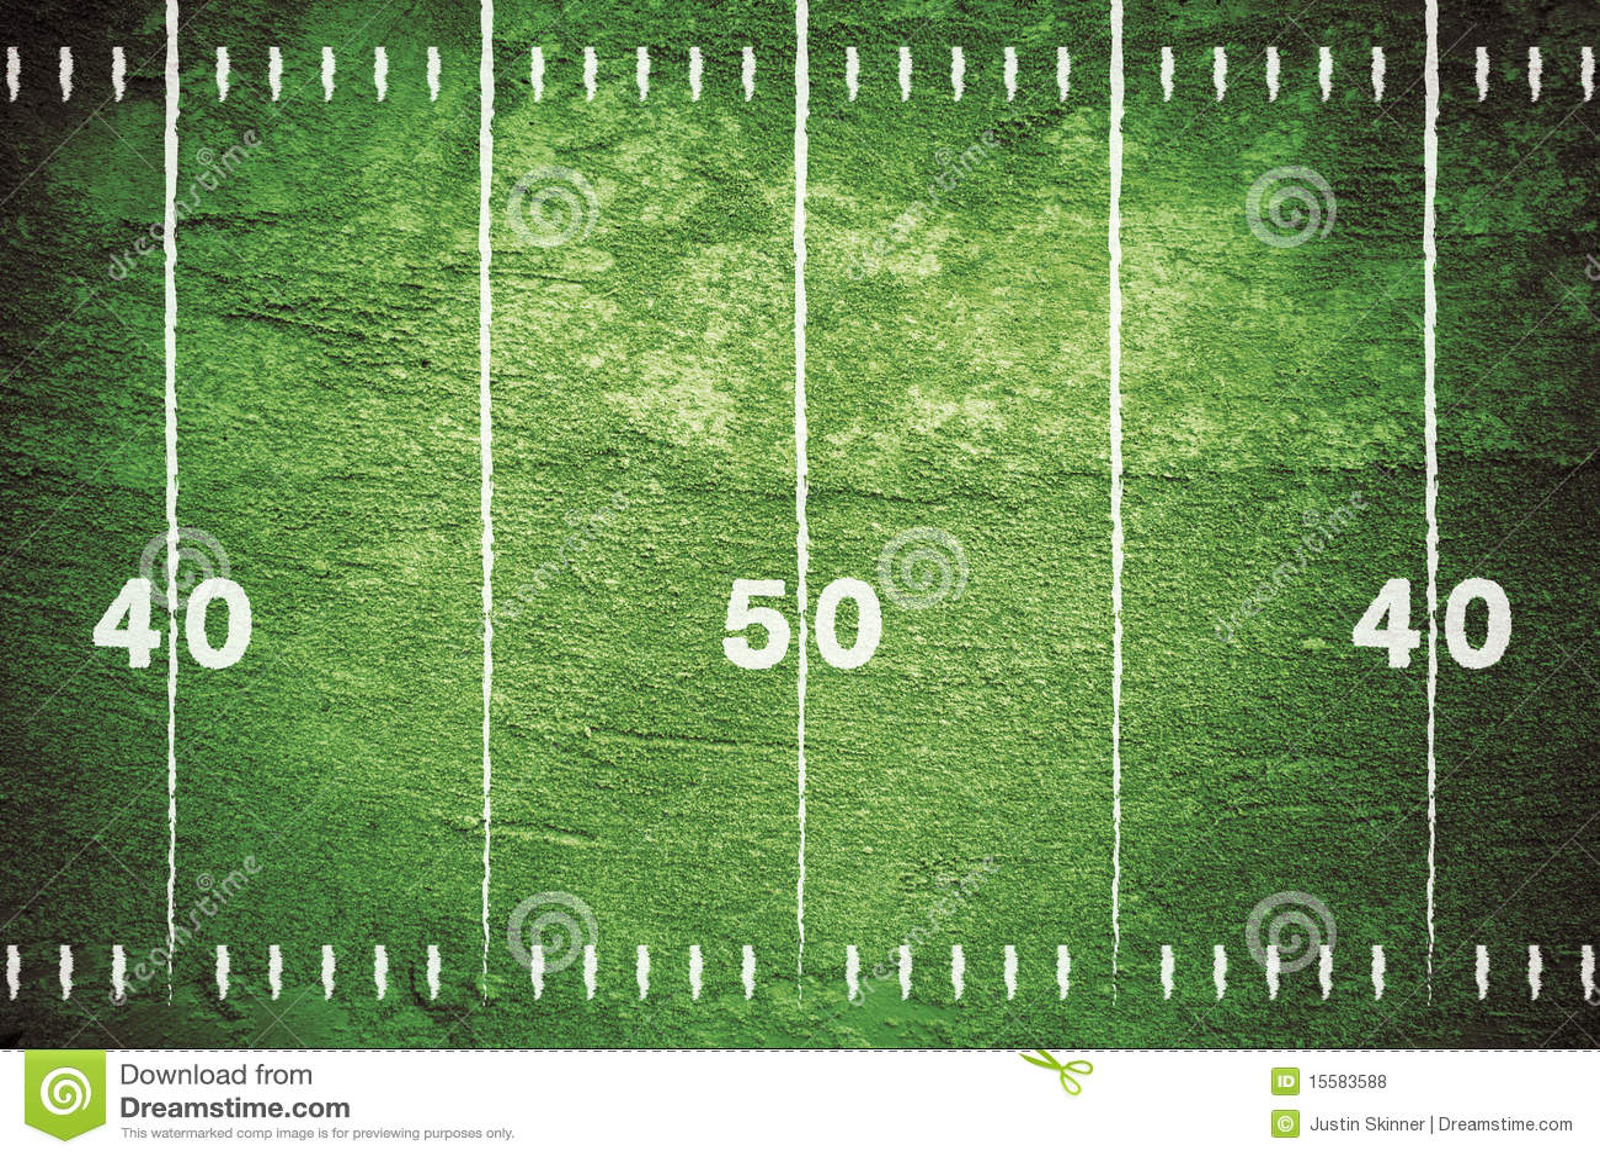 Grunge Football Field Stock Illustration Of